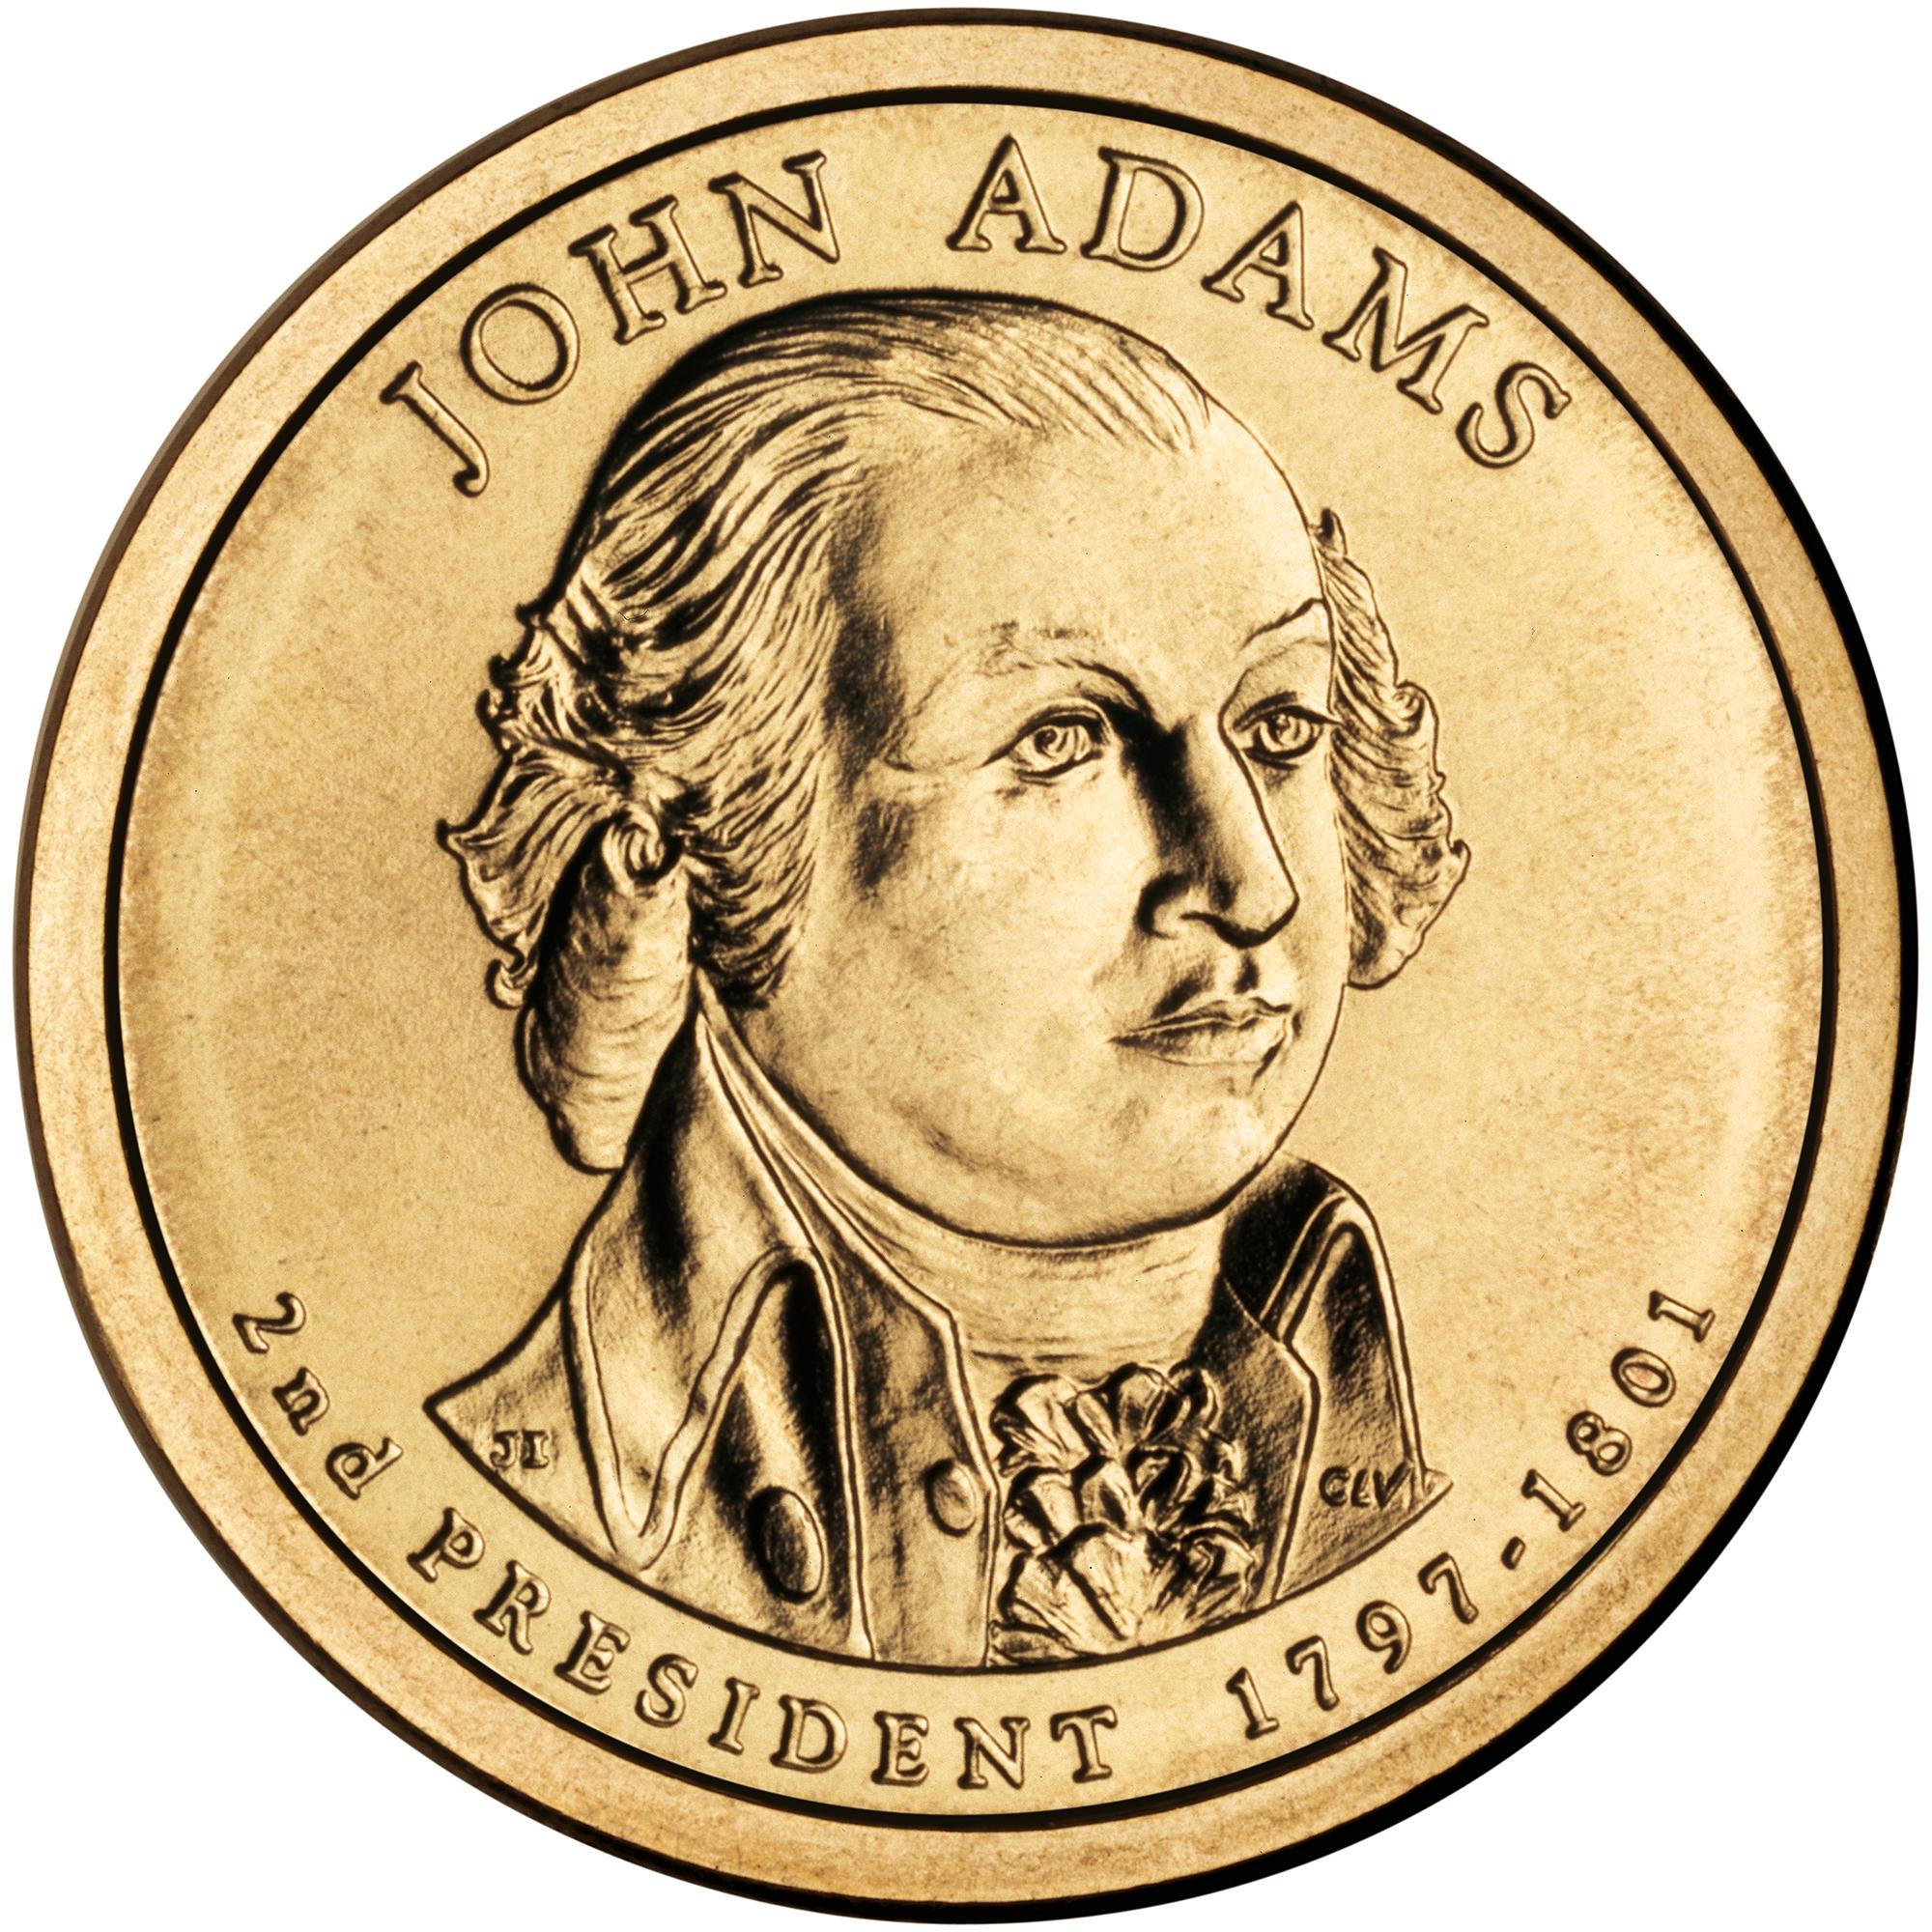 2007 Presidential Dollar Coin John Adams Uncirculated Obverse